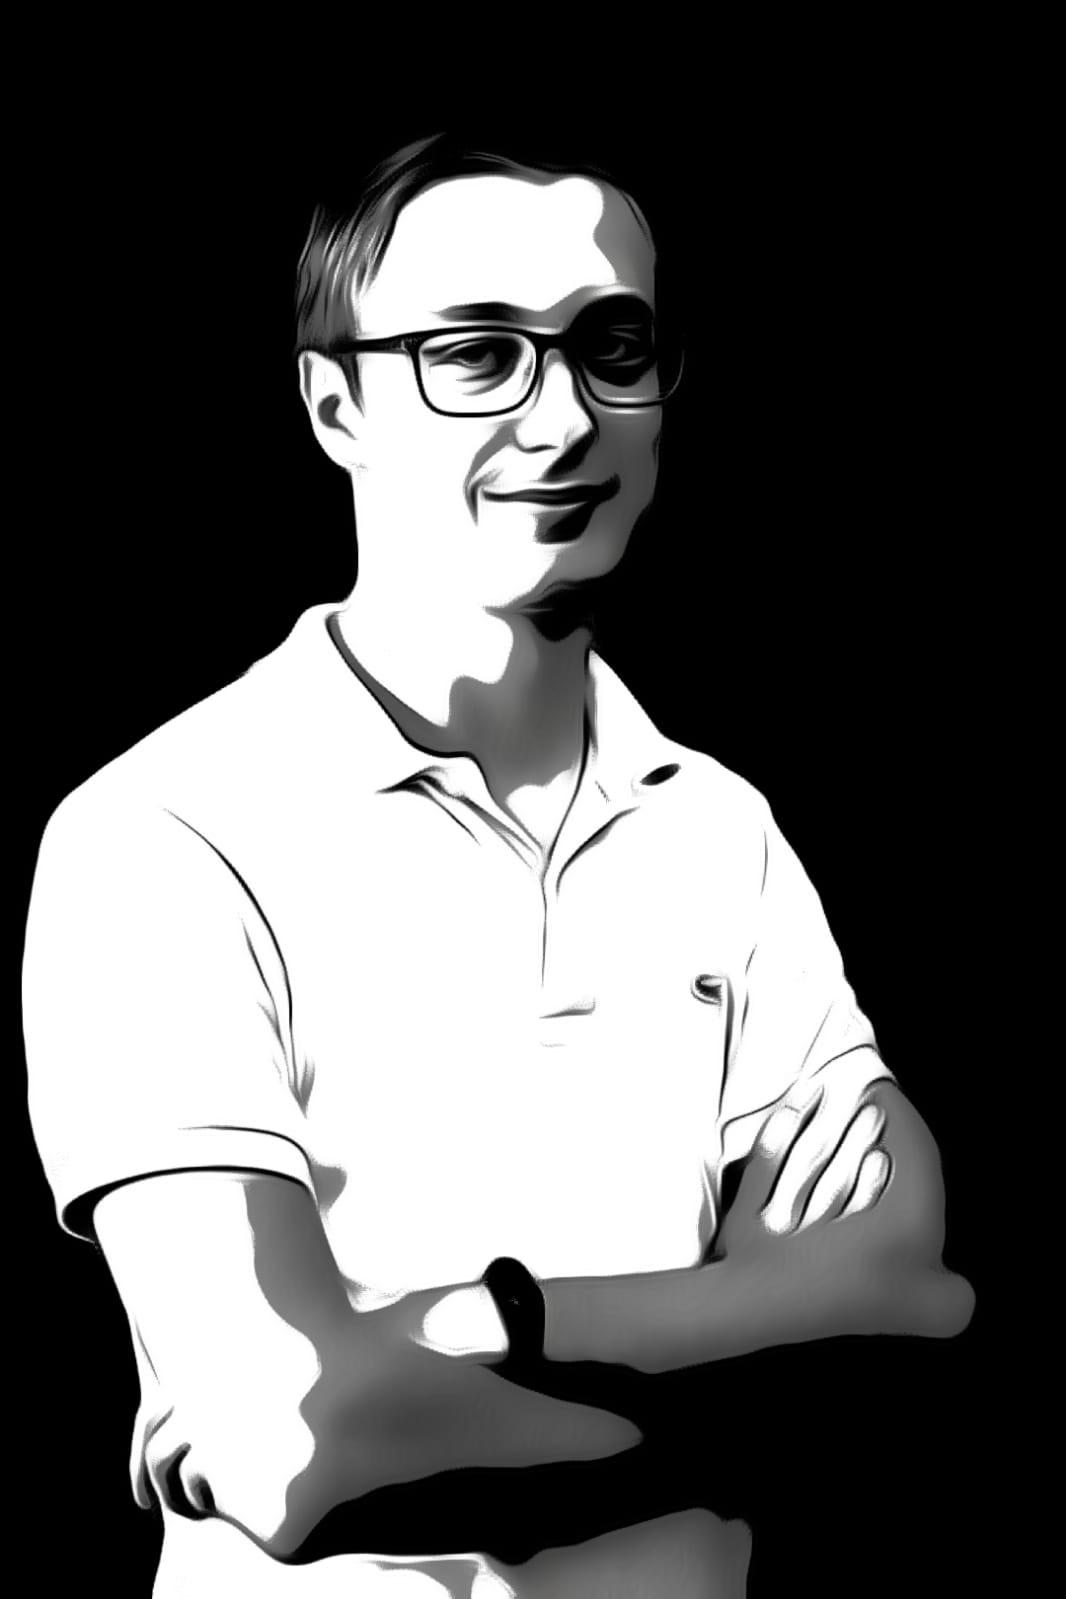 Florian DI LUZIO